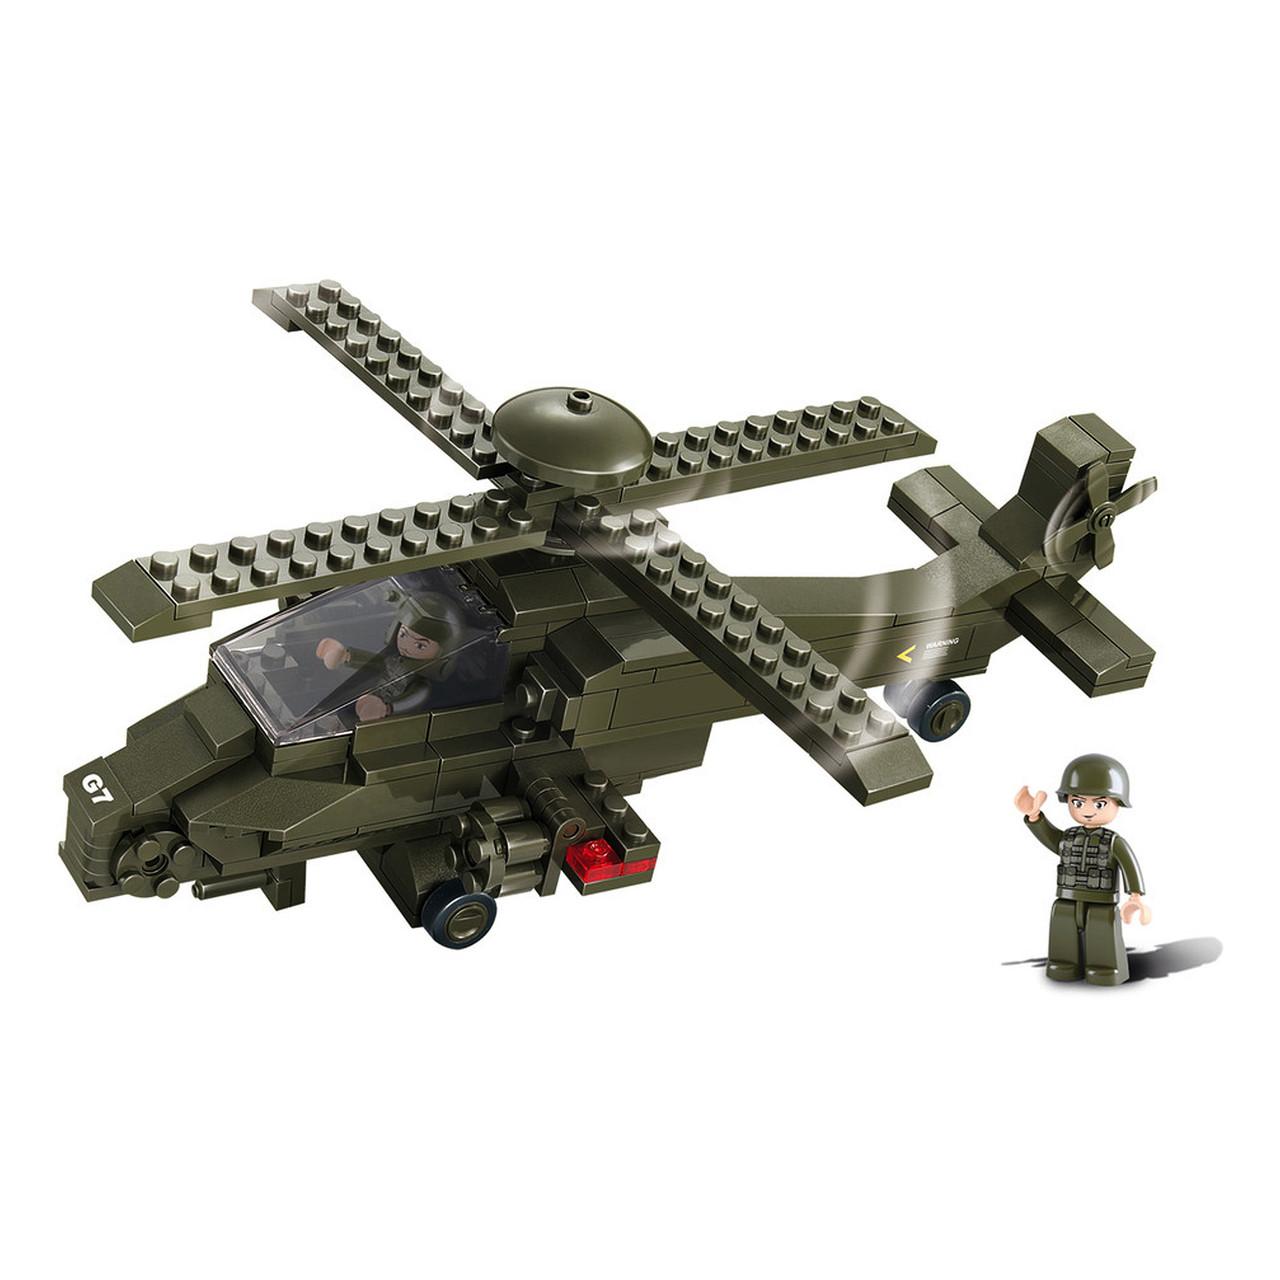 Конструктор «Sluban» (M38-B0298) вертолёт, 199 элементов